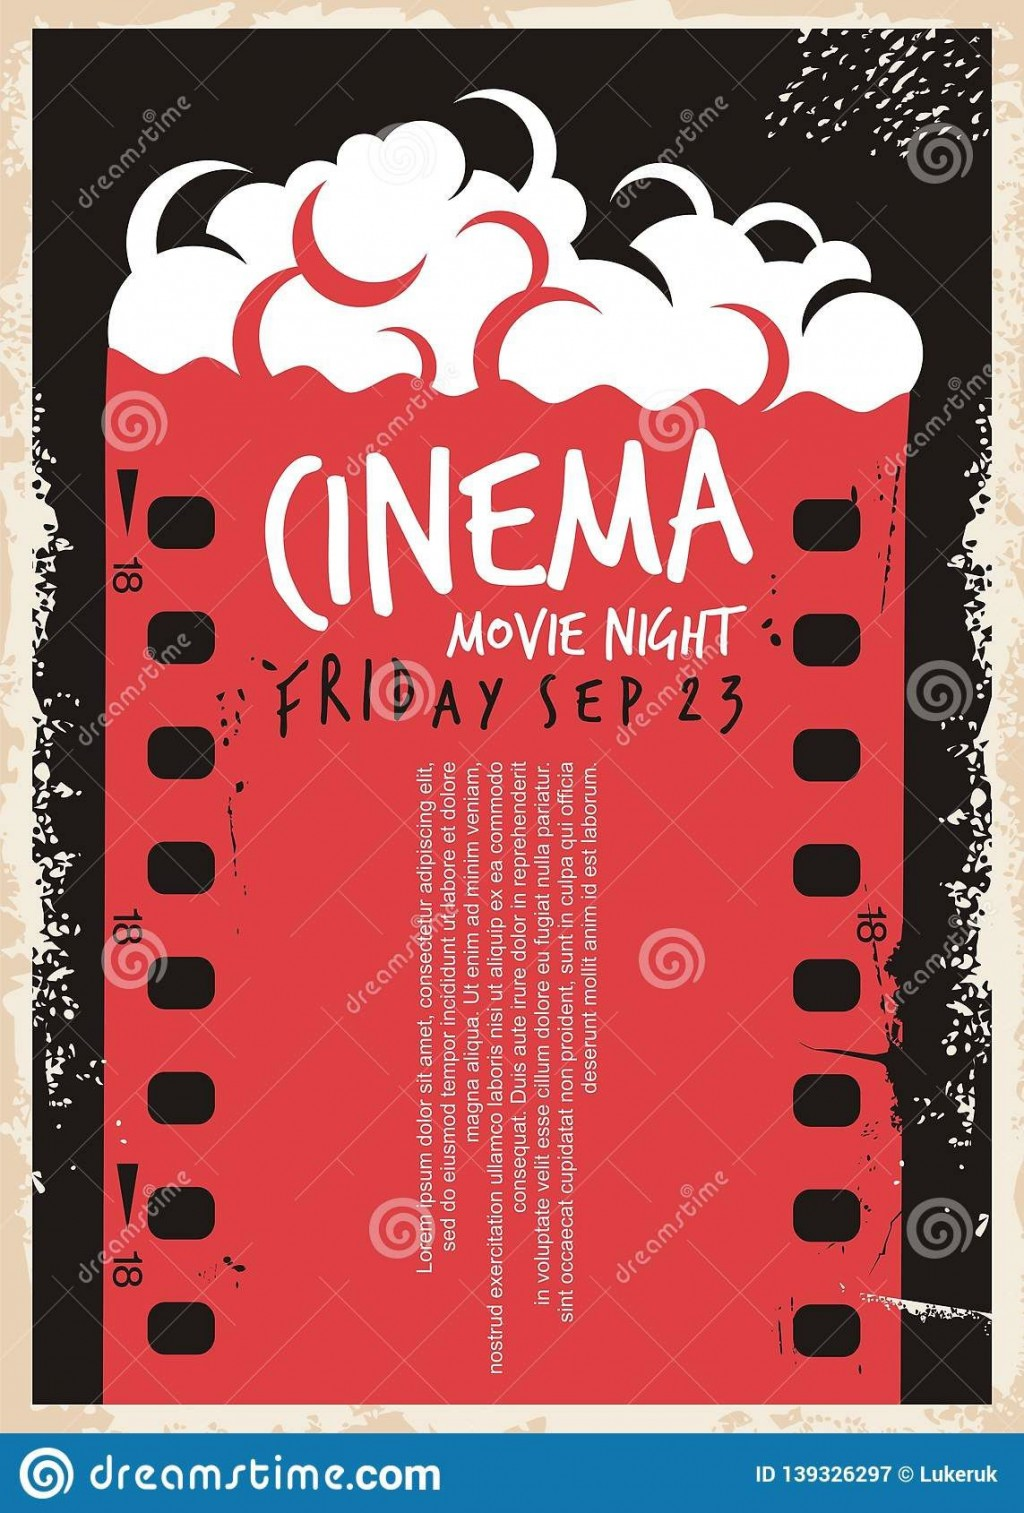 005 Sensational Movie Night Flyer Template Inspiration  Editable Psd FreeLarge